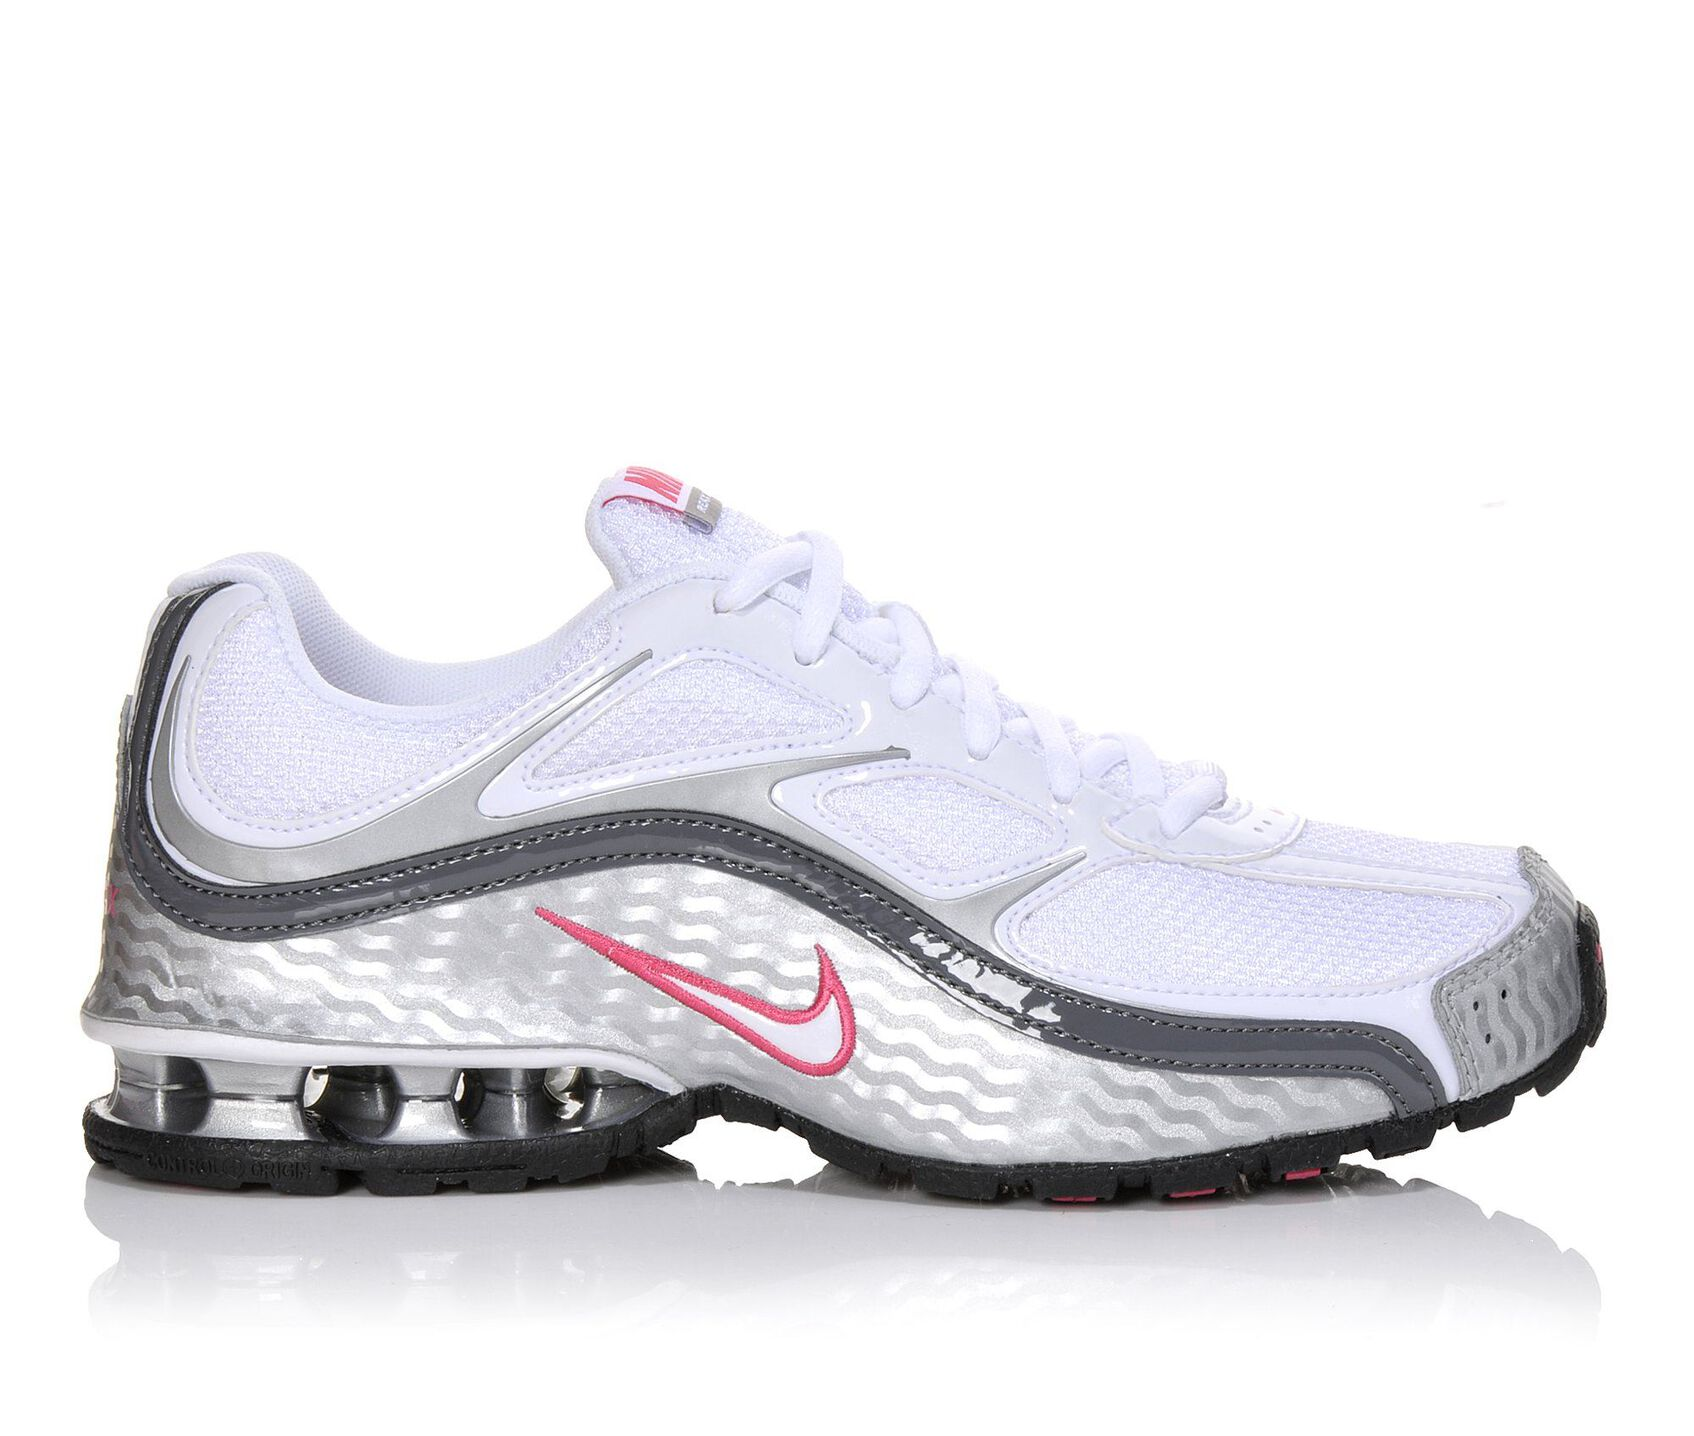 ... Nike Reax Run 5 Running Shoes. Carousel Controls 2268d0f05